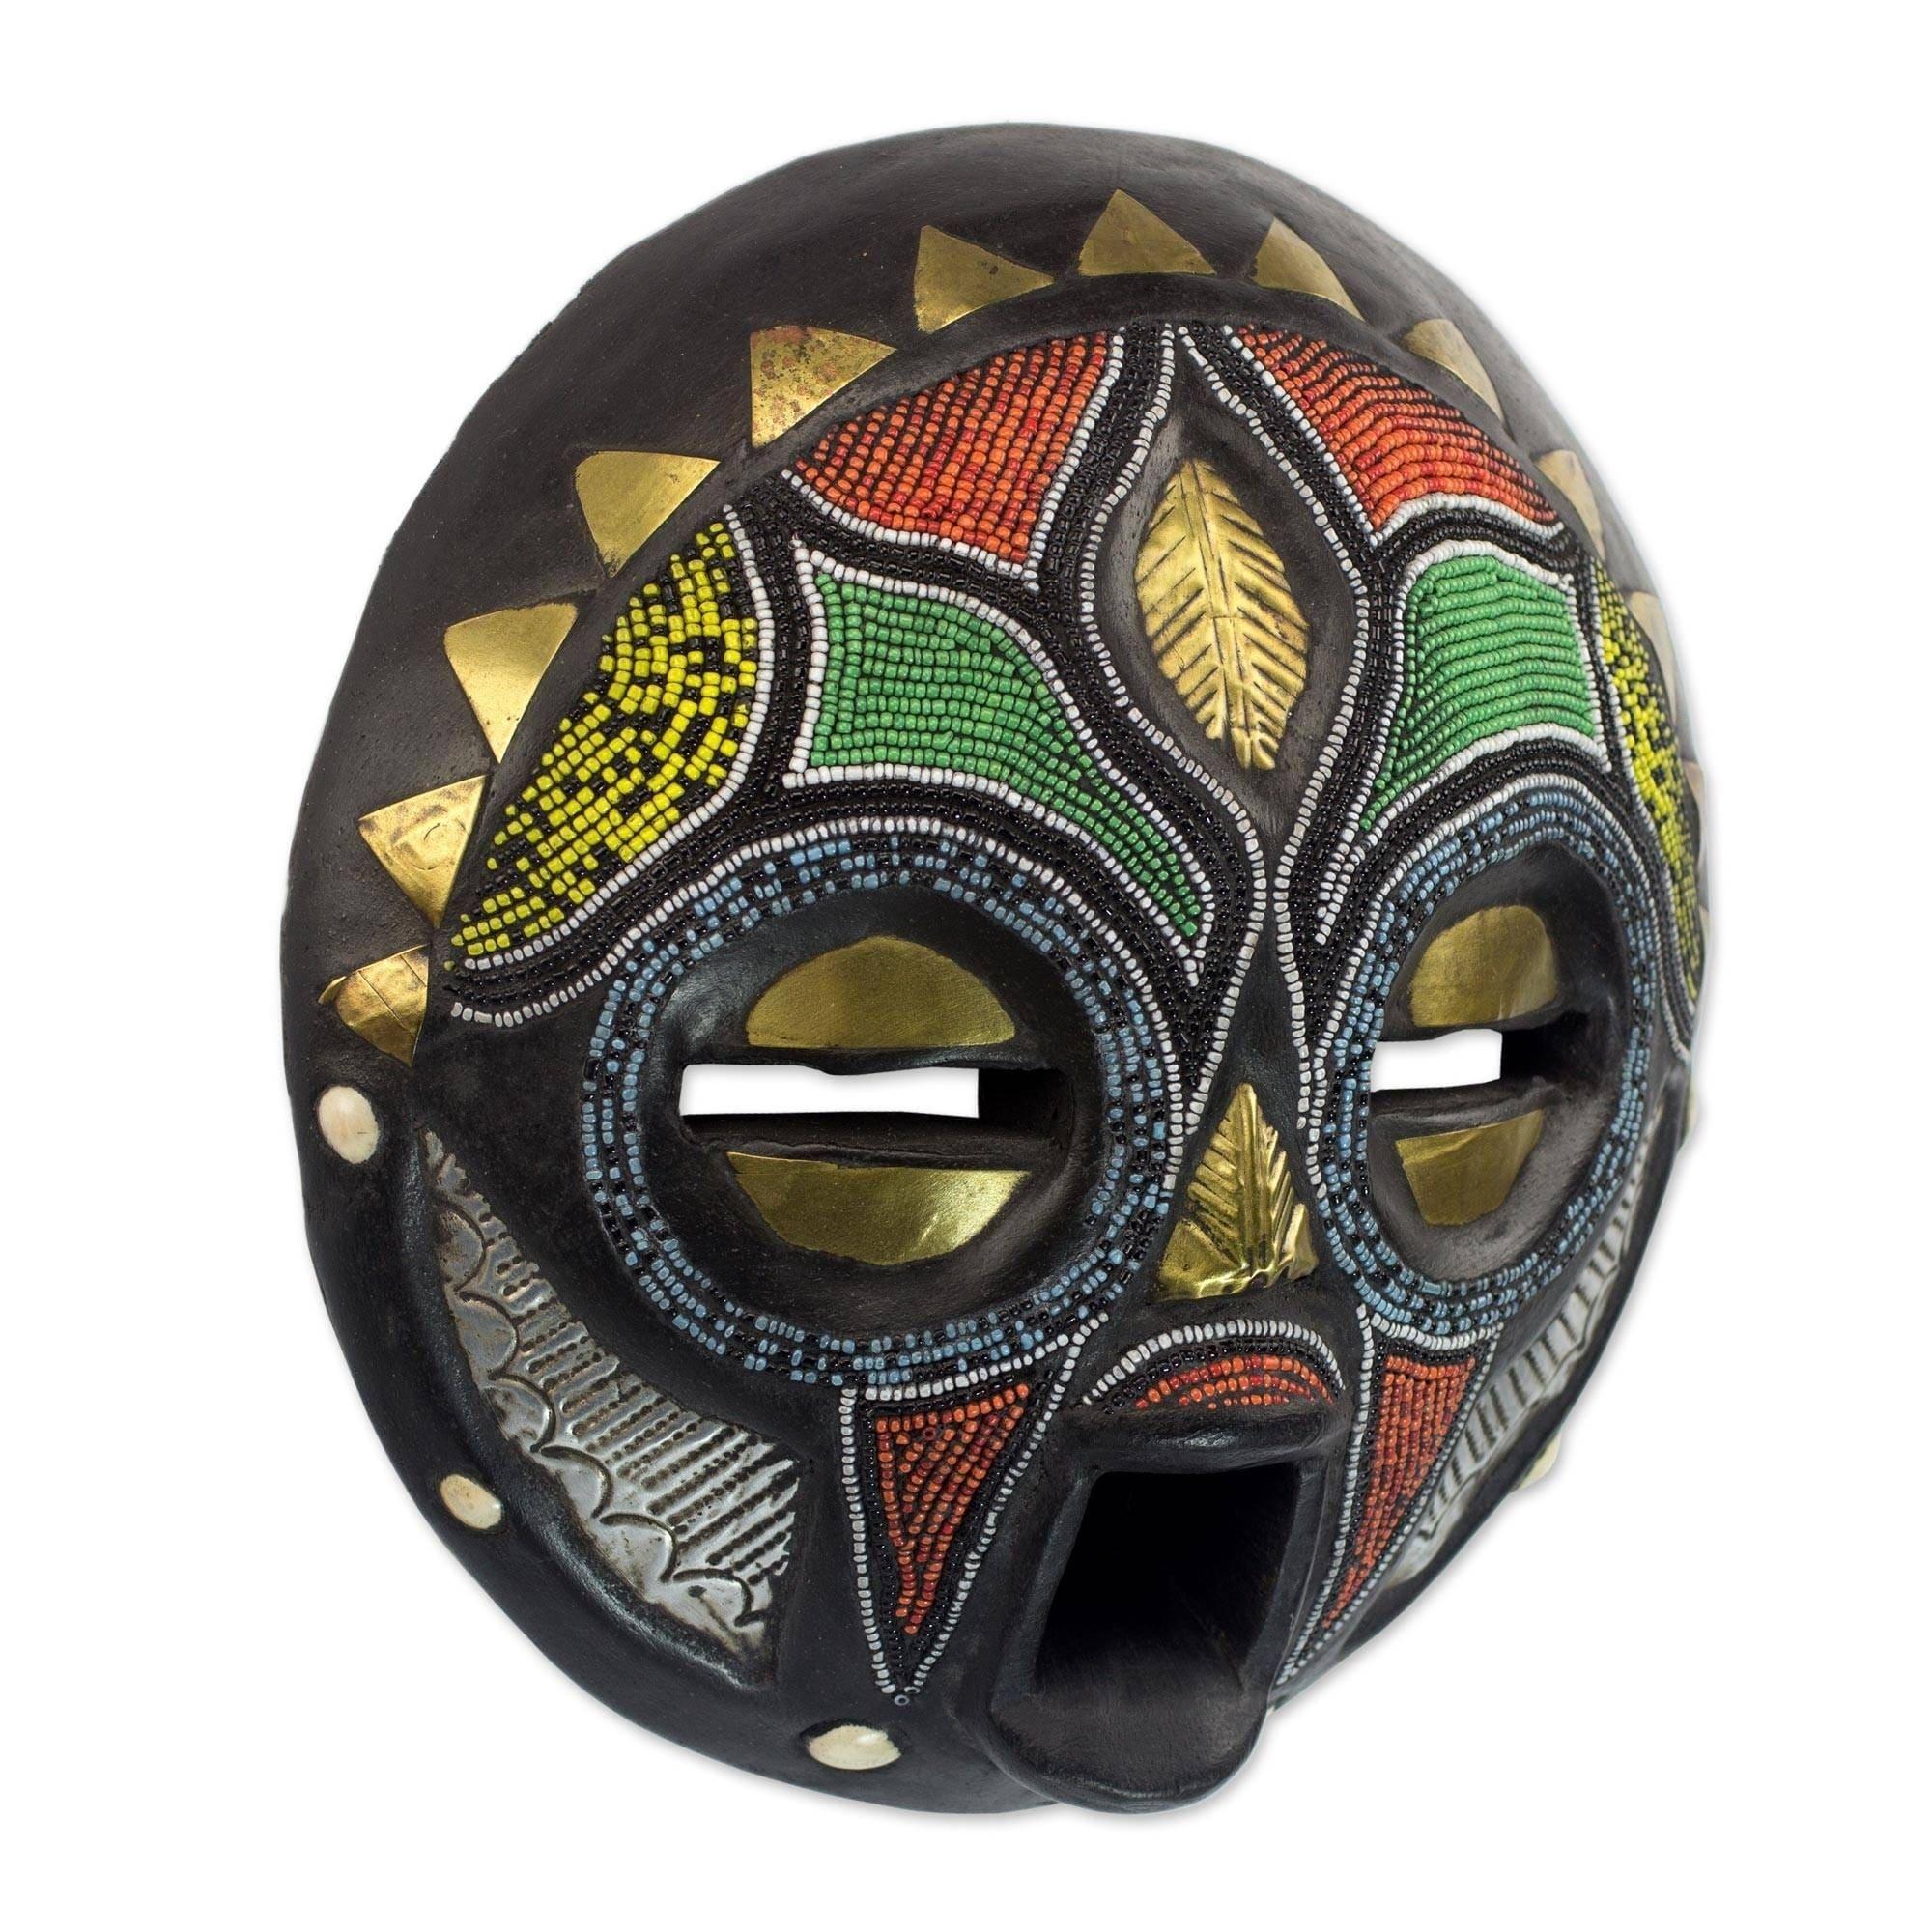 Afričke maske - Page 4 Handmade-Sese-Wood-Girl-Grows-Up-African-Mask-Ghana-Blue-Green-Red-Yellow-a8f49307-33ae-4855-8286-e97396f551ad